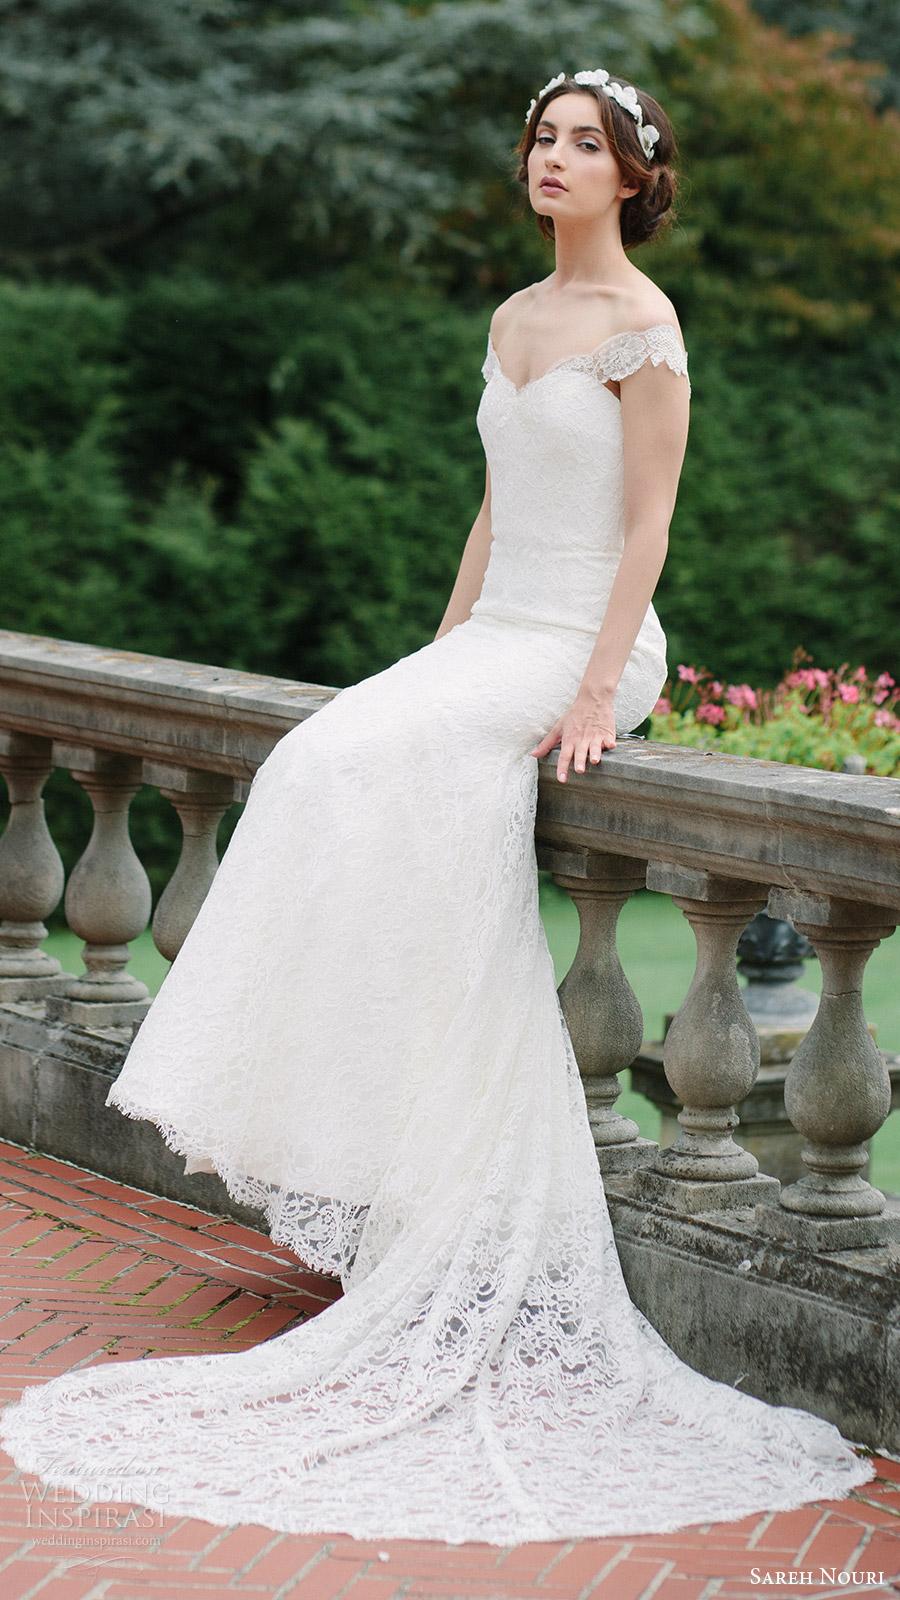 sareh nouri bridal fall 2016 short sleeves off shoulder trumpet mermaid lace wedding dress (jannan) sv train romantic elegant